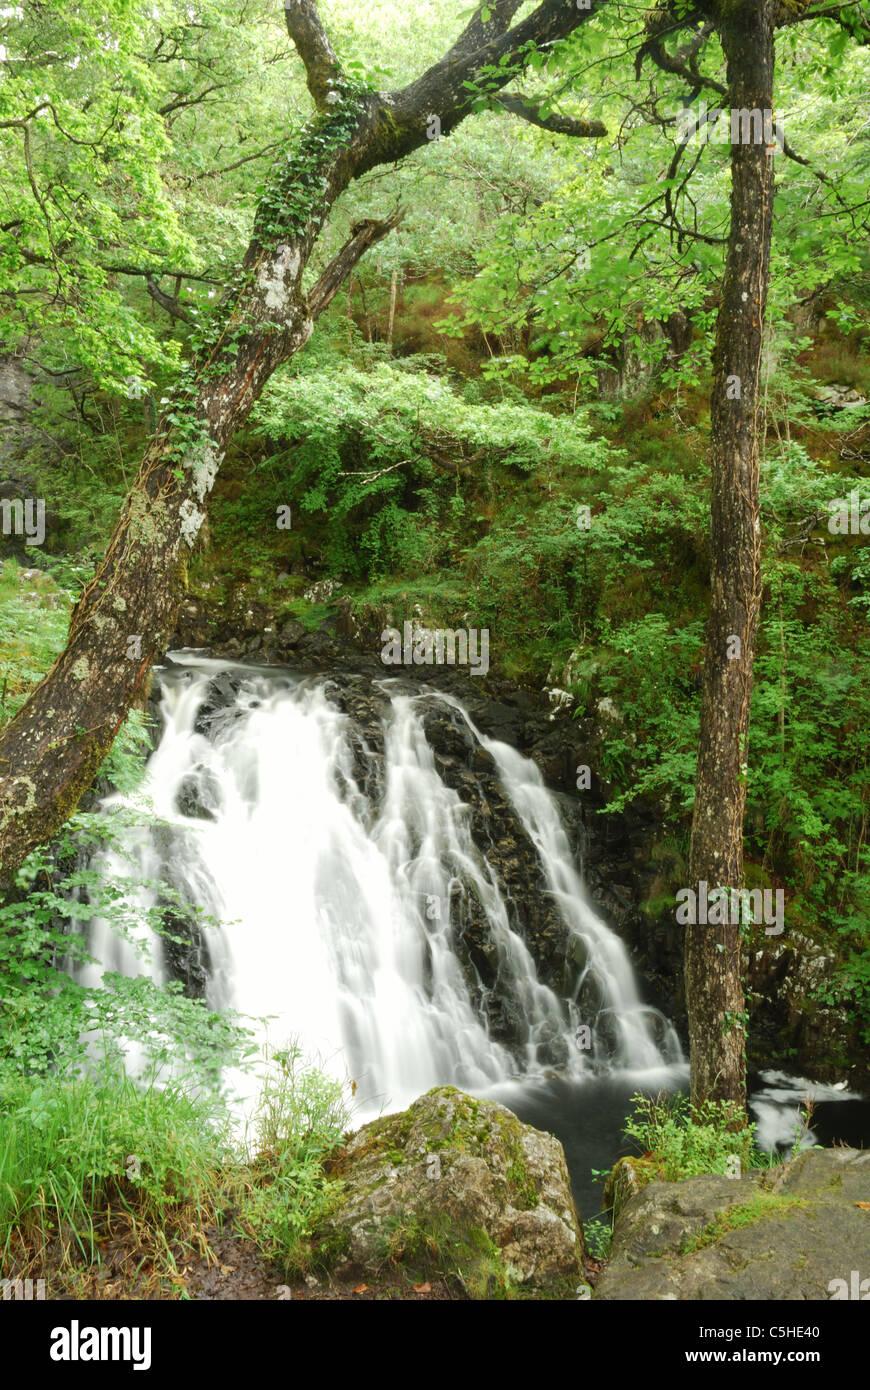 Rhaiadr Ddu waterfall, Afon Gamlan, Snowdonia, North Wales, UK - Stock Image